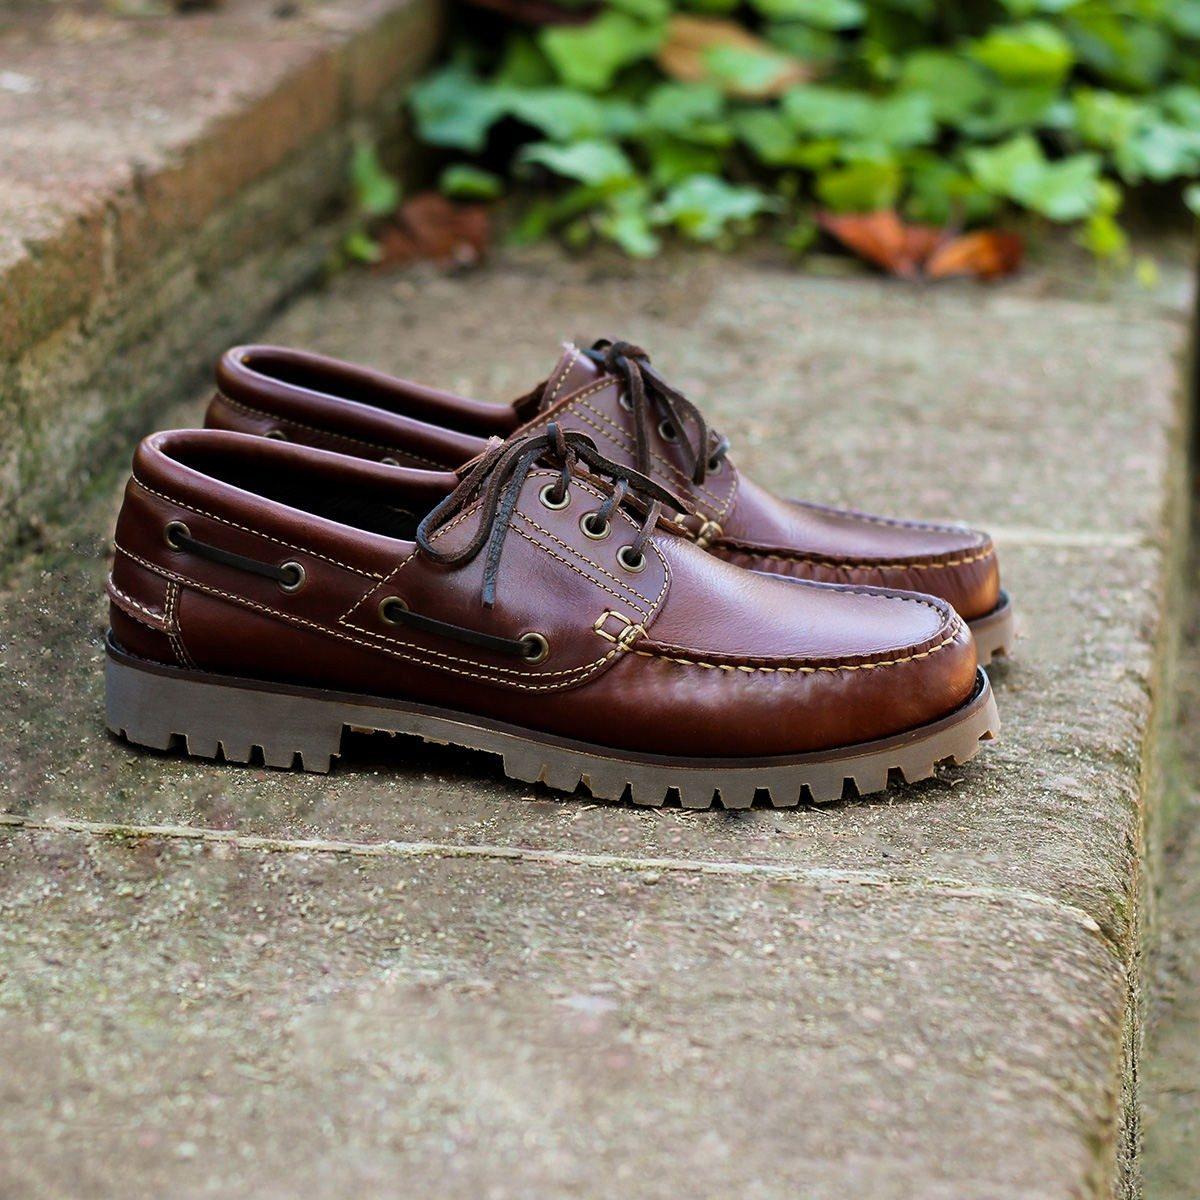 JULES & JENN - chaussures bateau crampons marron